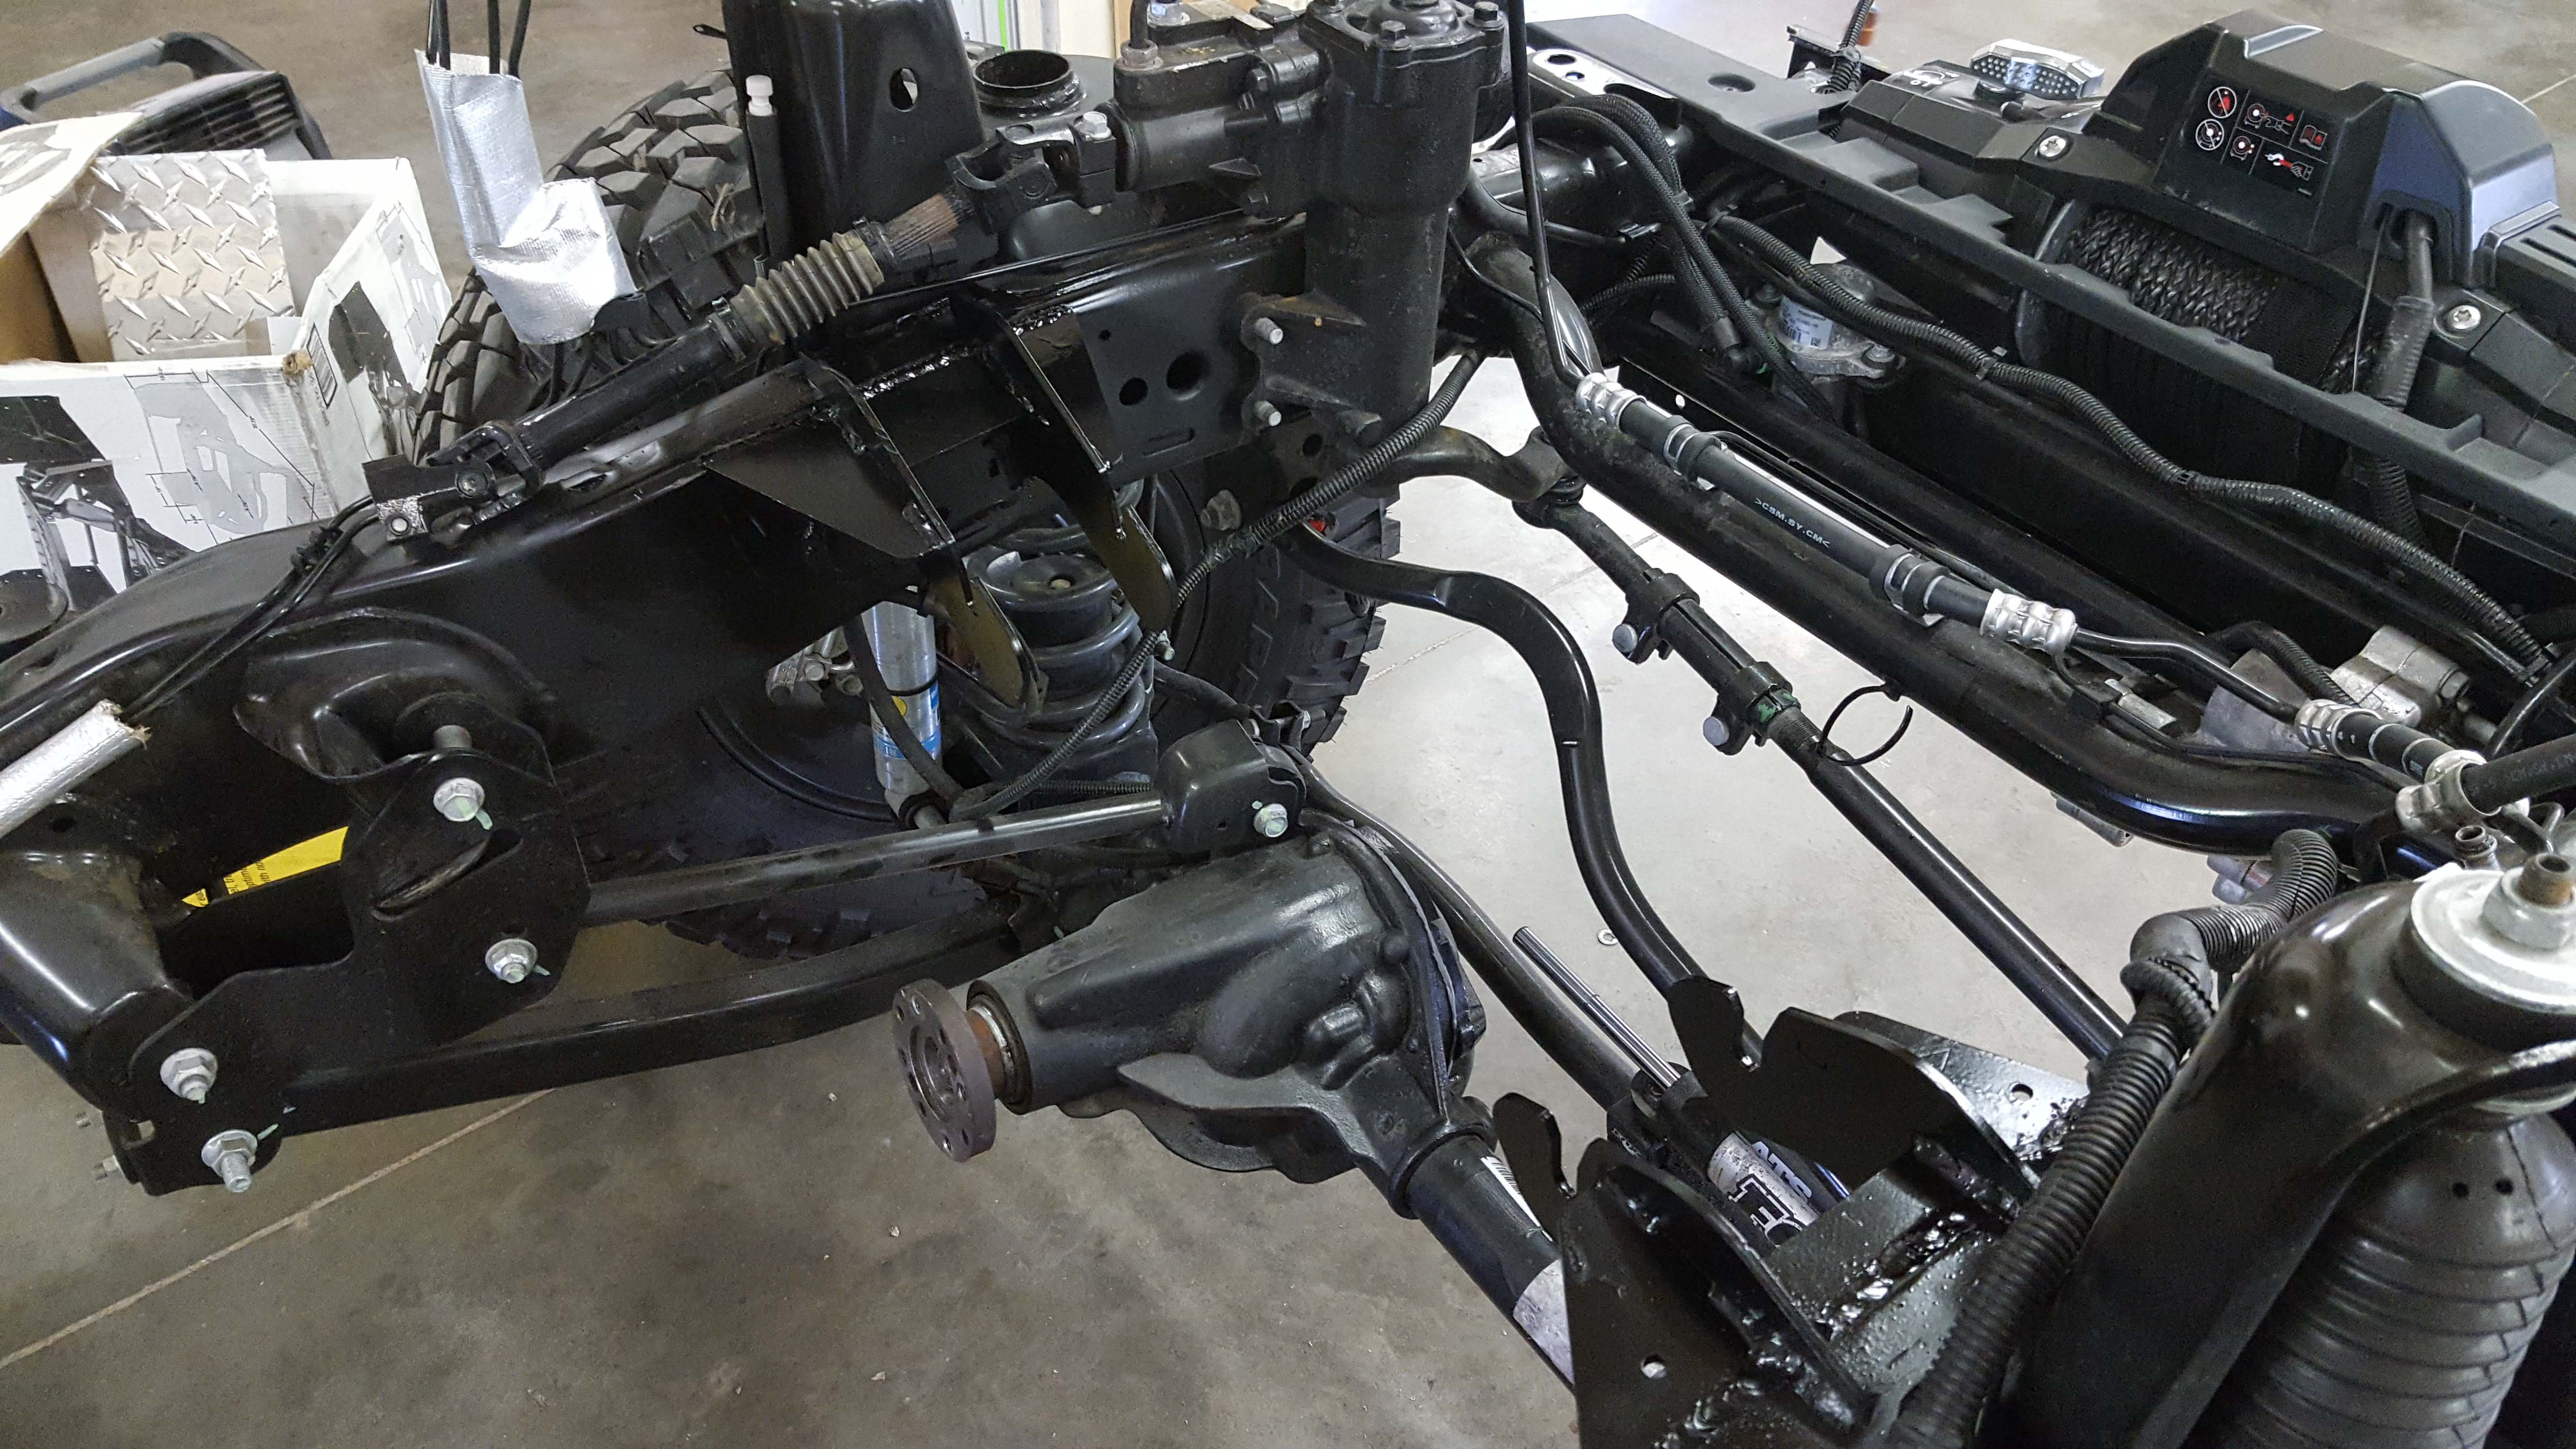 Jeep Jk Hemi Wiring Harness Wire Data Schema Conversion Kit Nuthouse Industries Rh Nuthouseindustries Com Wrangler Trailer